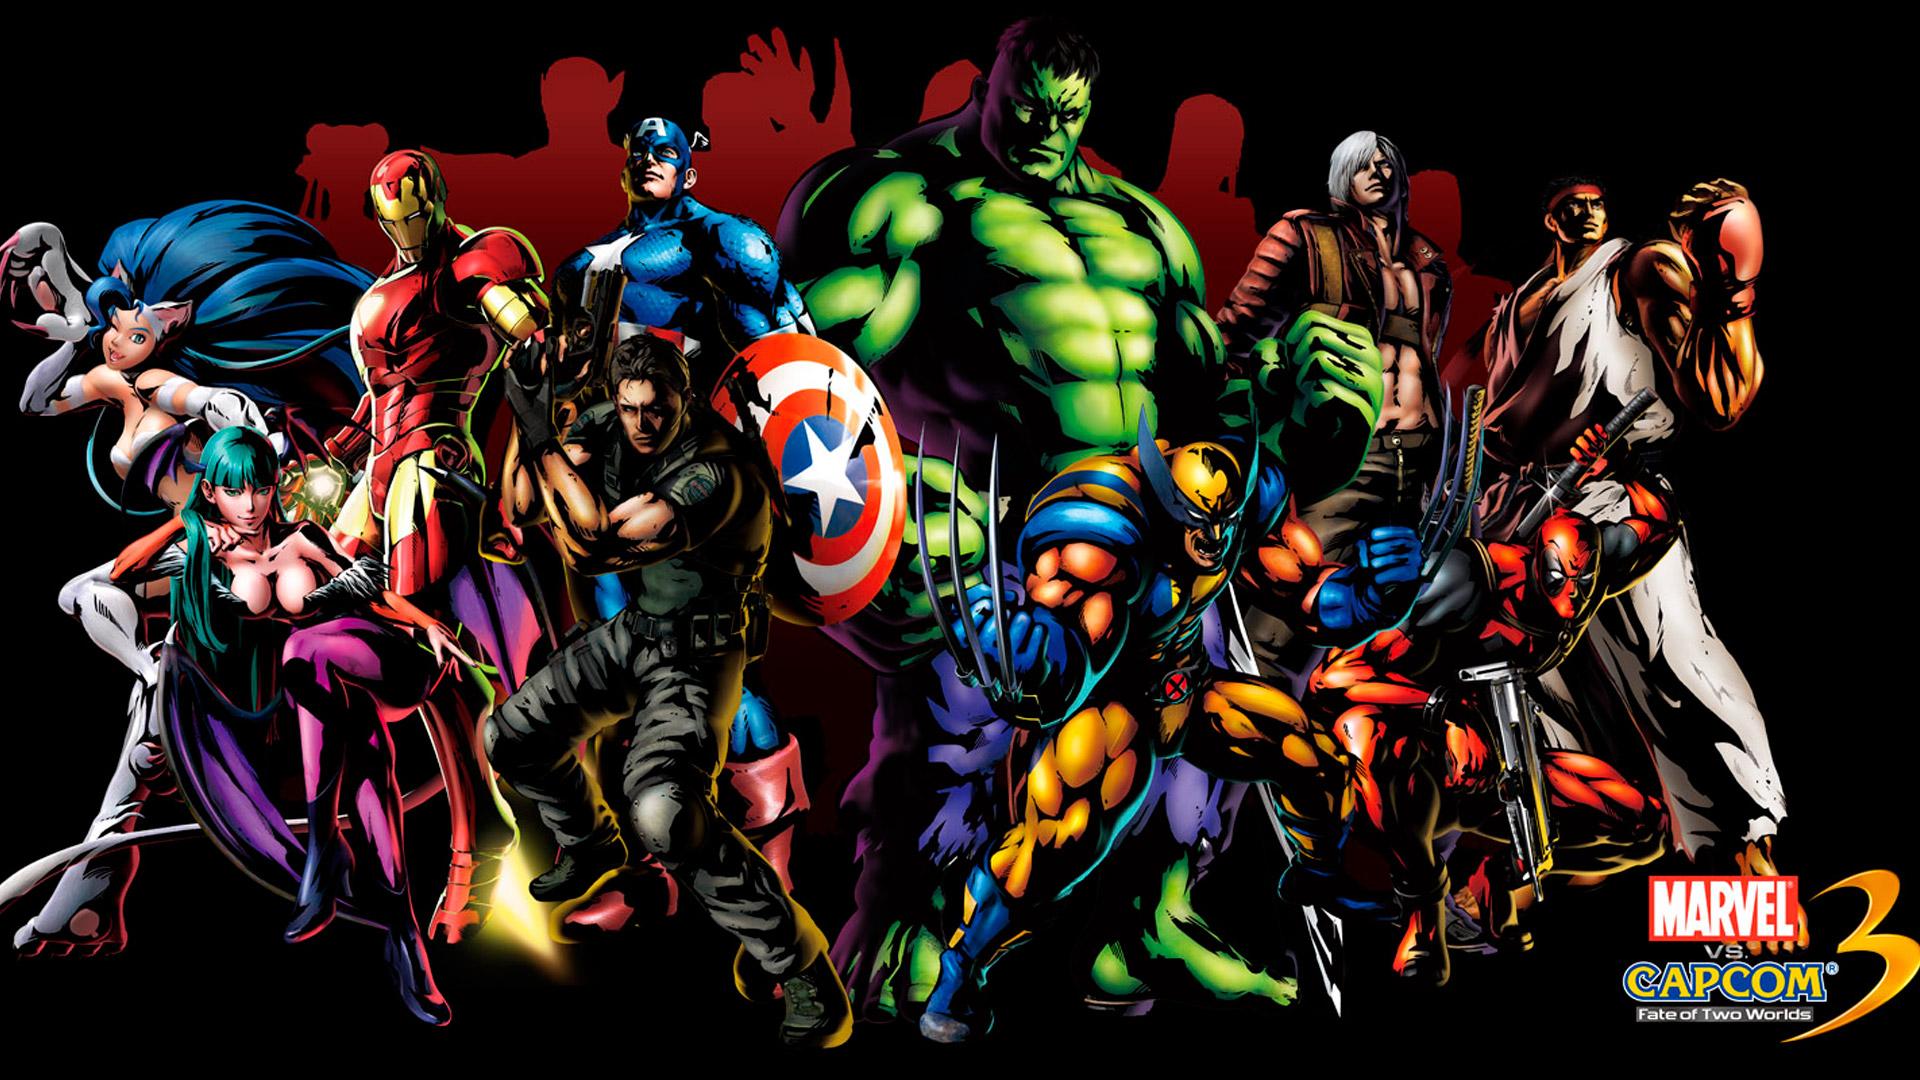 50 Marvel Vs Capcom 3 Wallpaper On Wallpapersafari